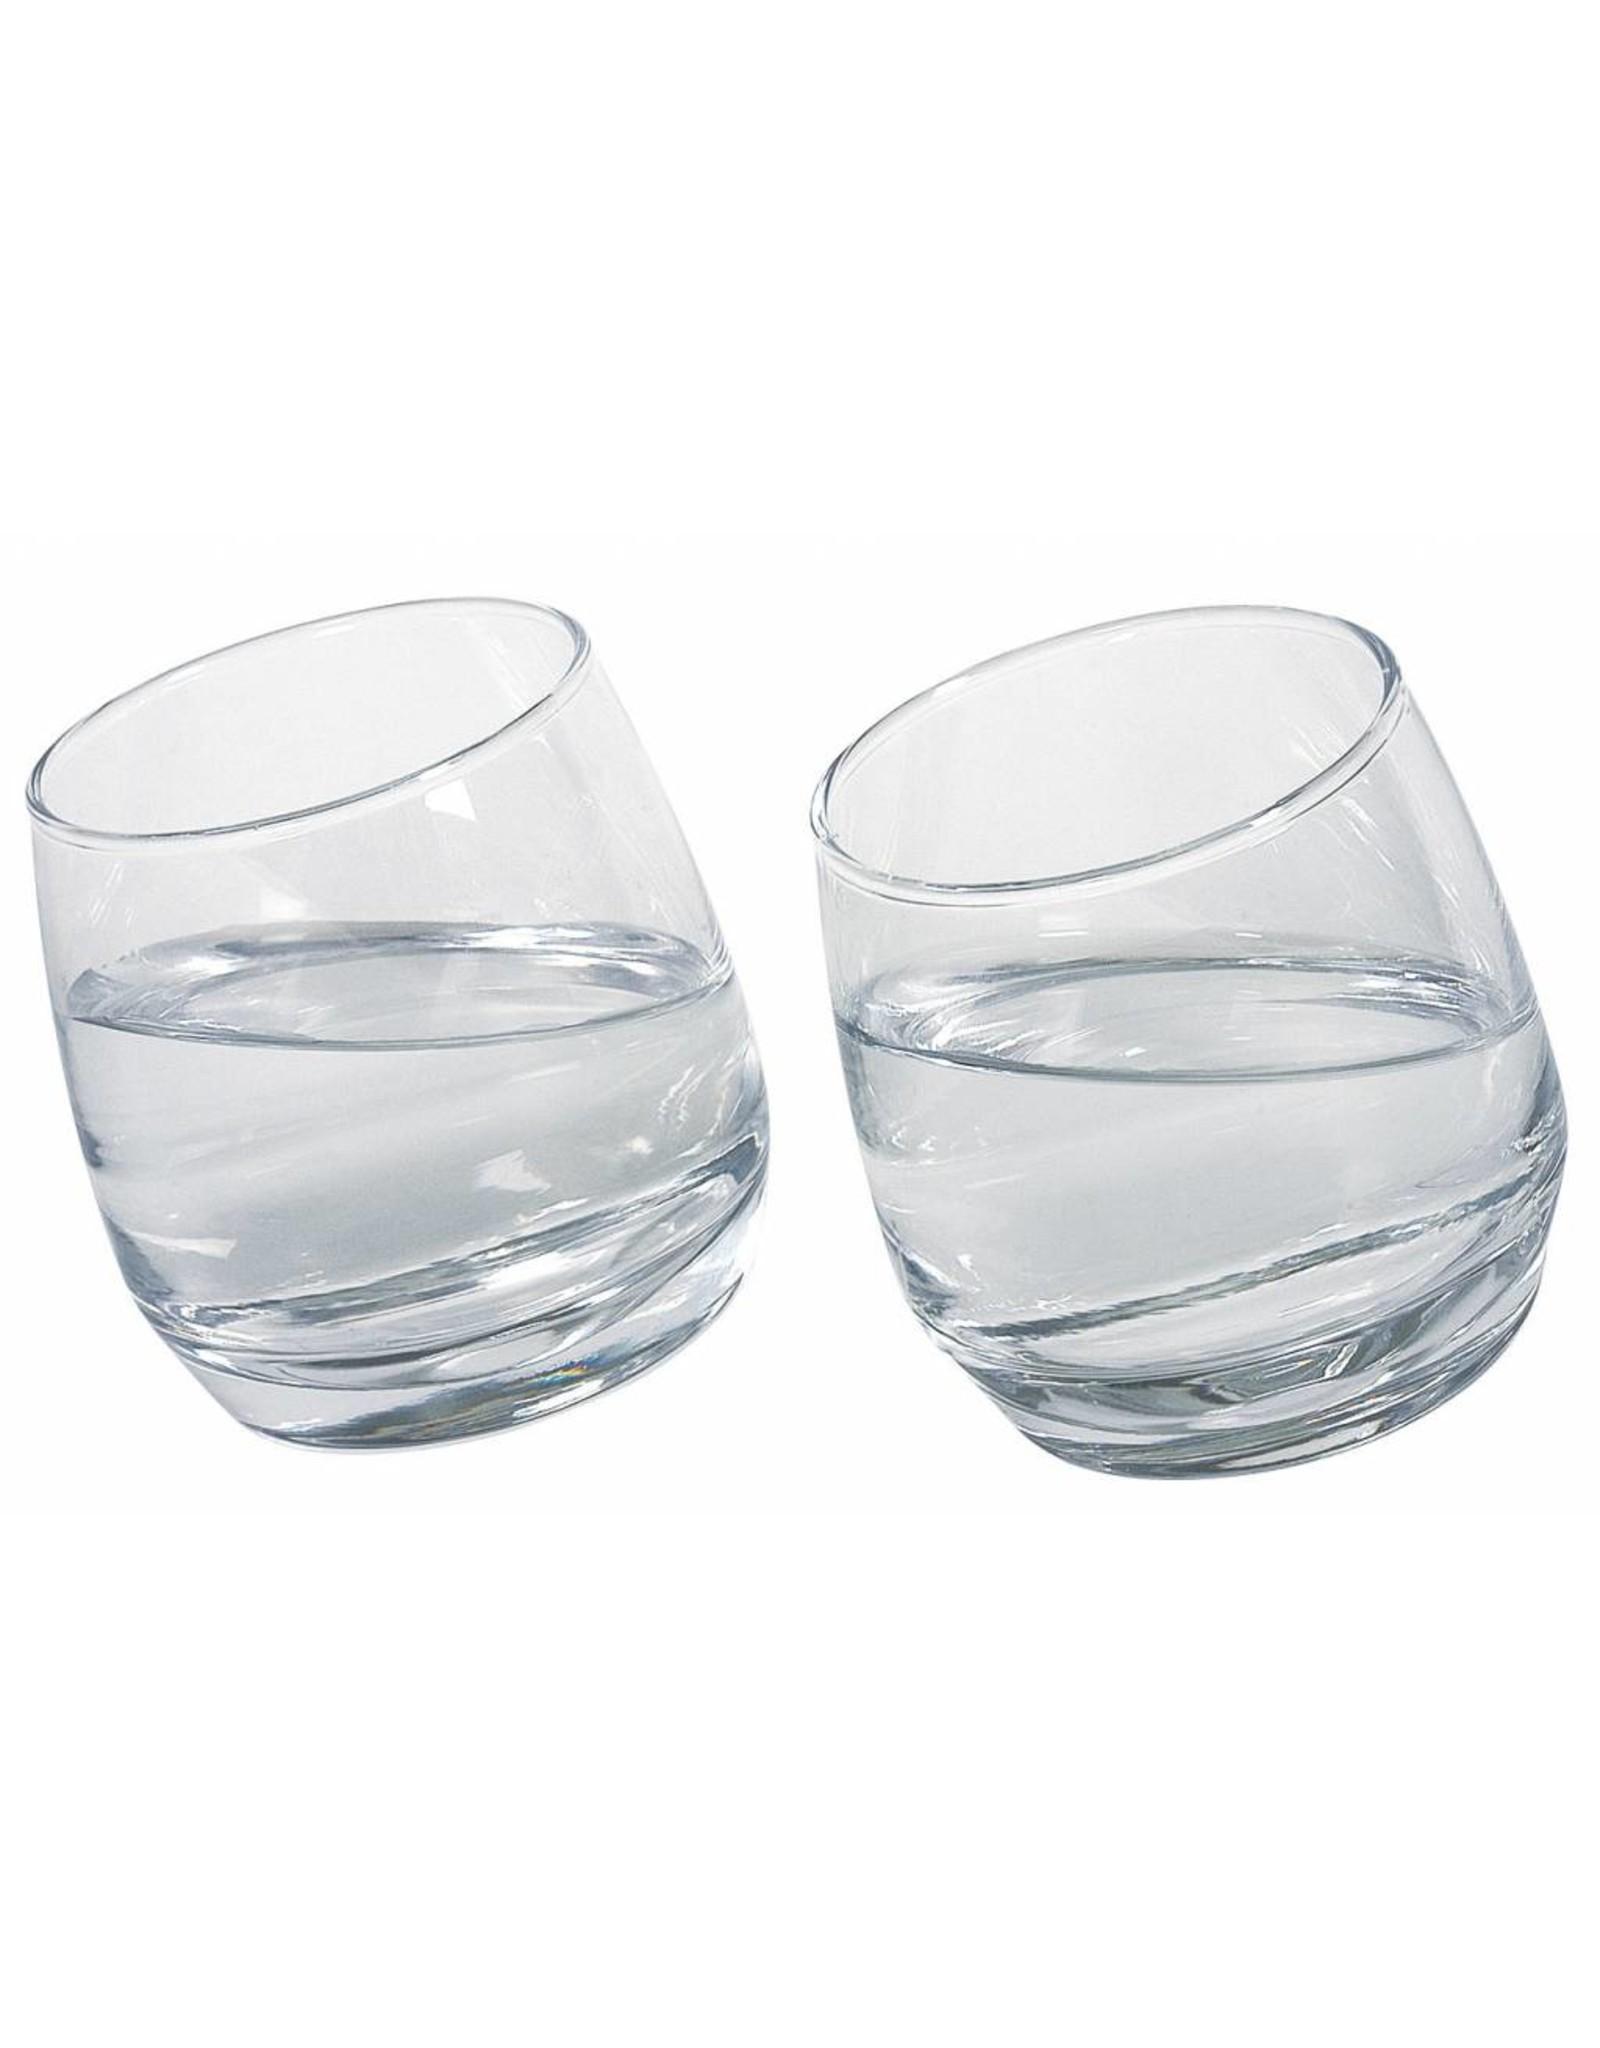 whiskey glass - cuba